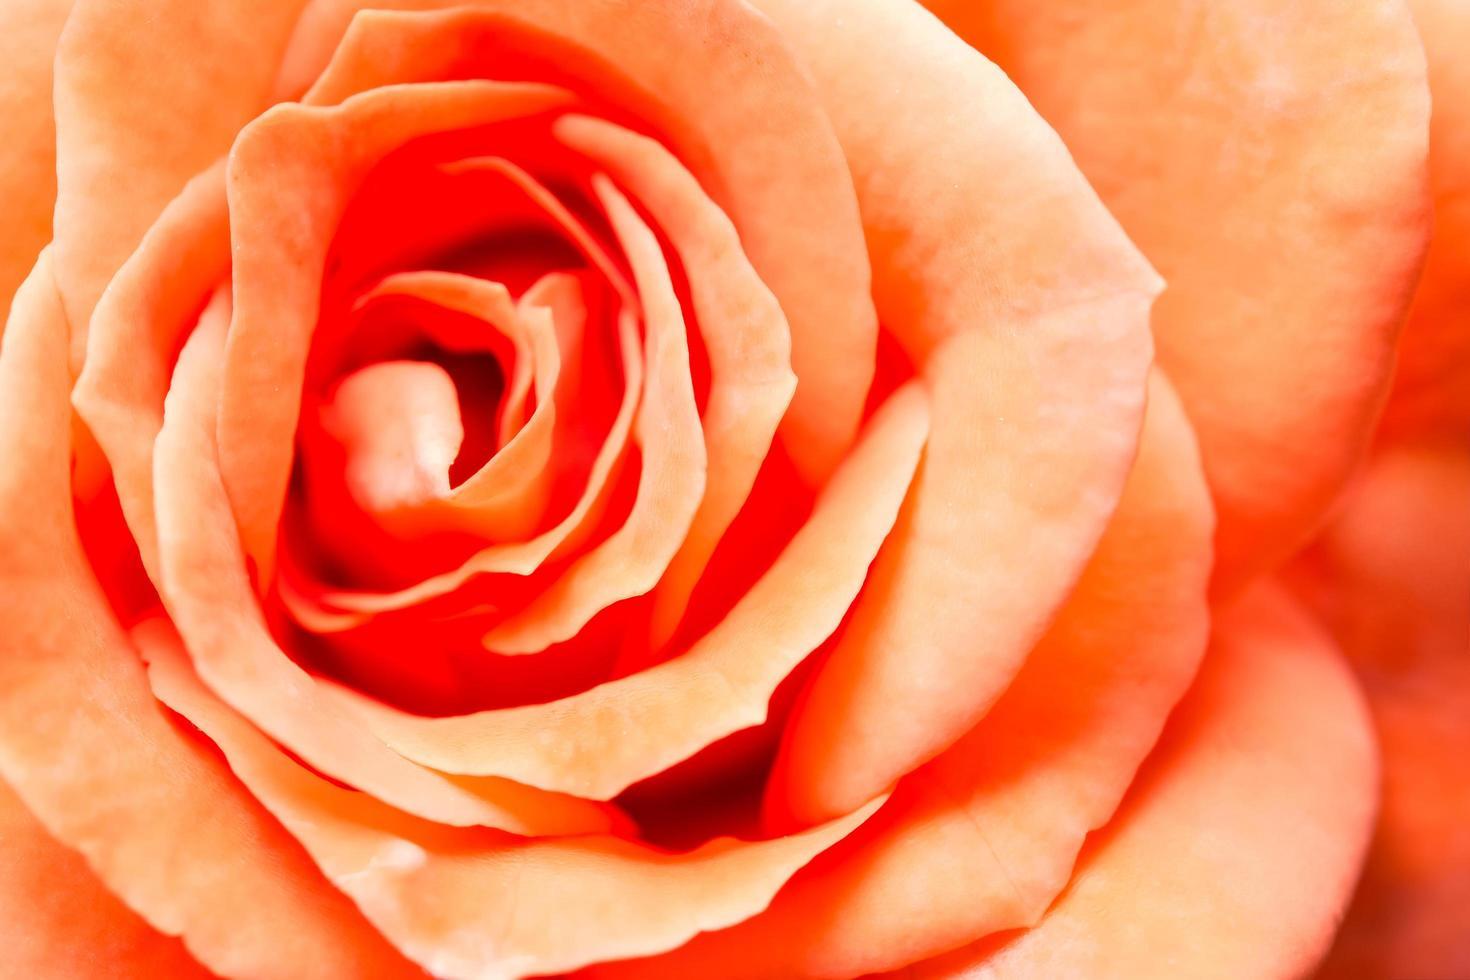 fondo rosa naranja foto